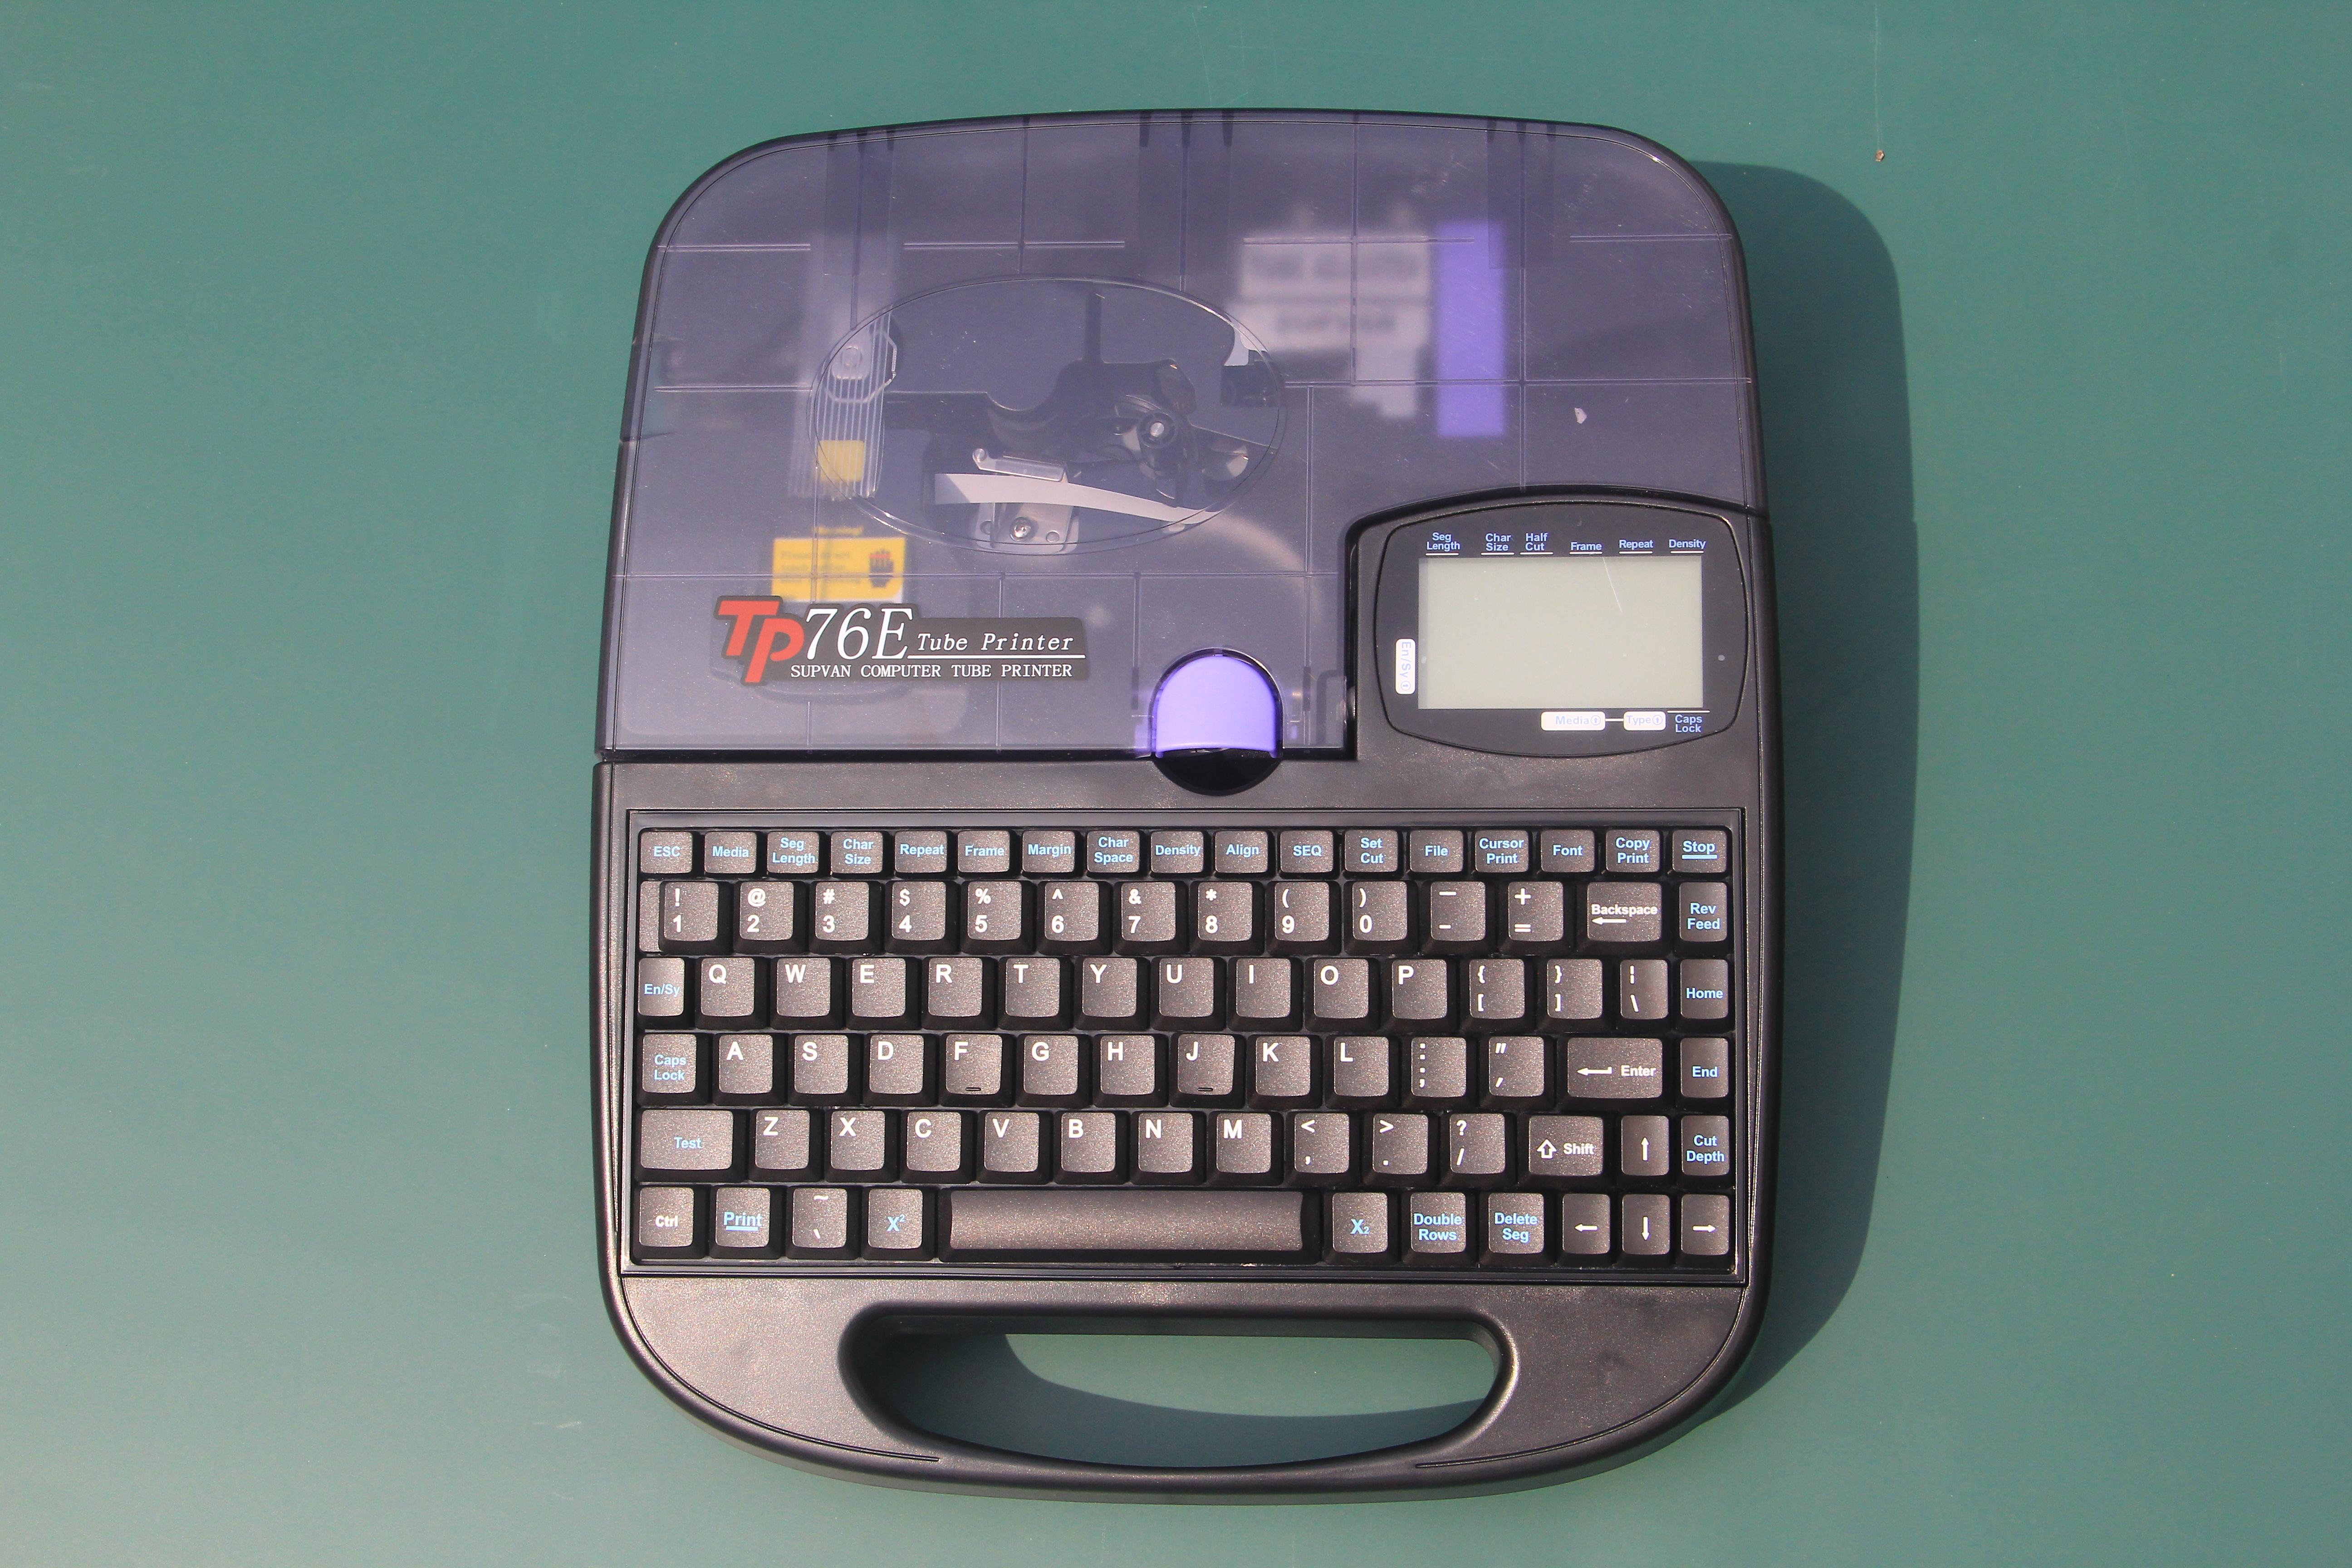 TP76E Printer